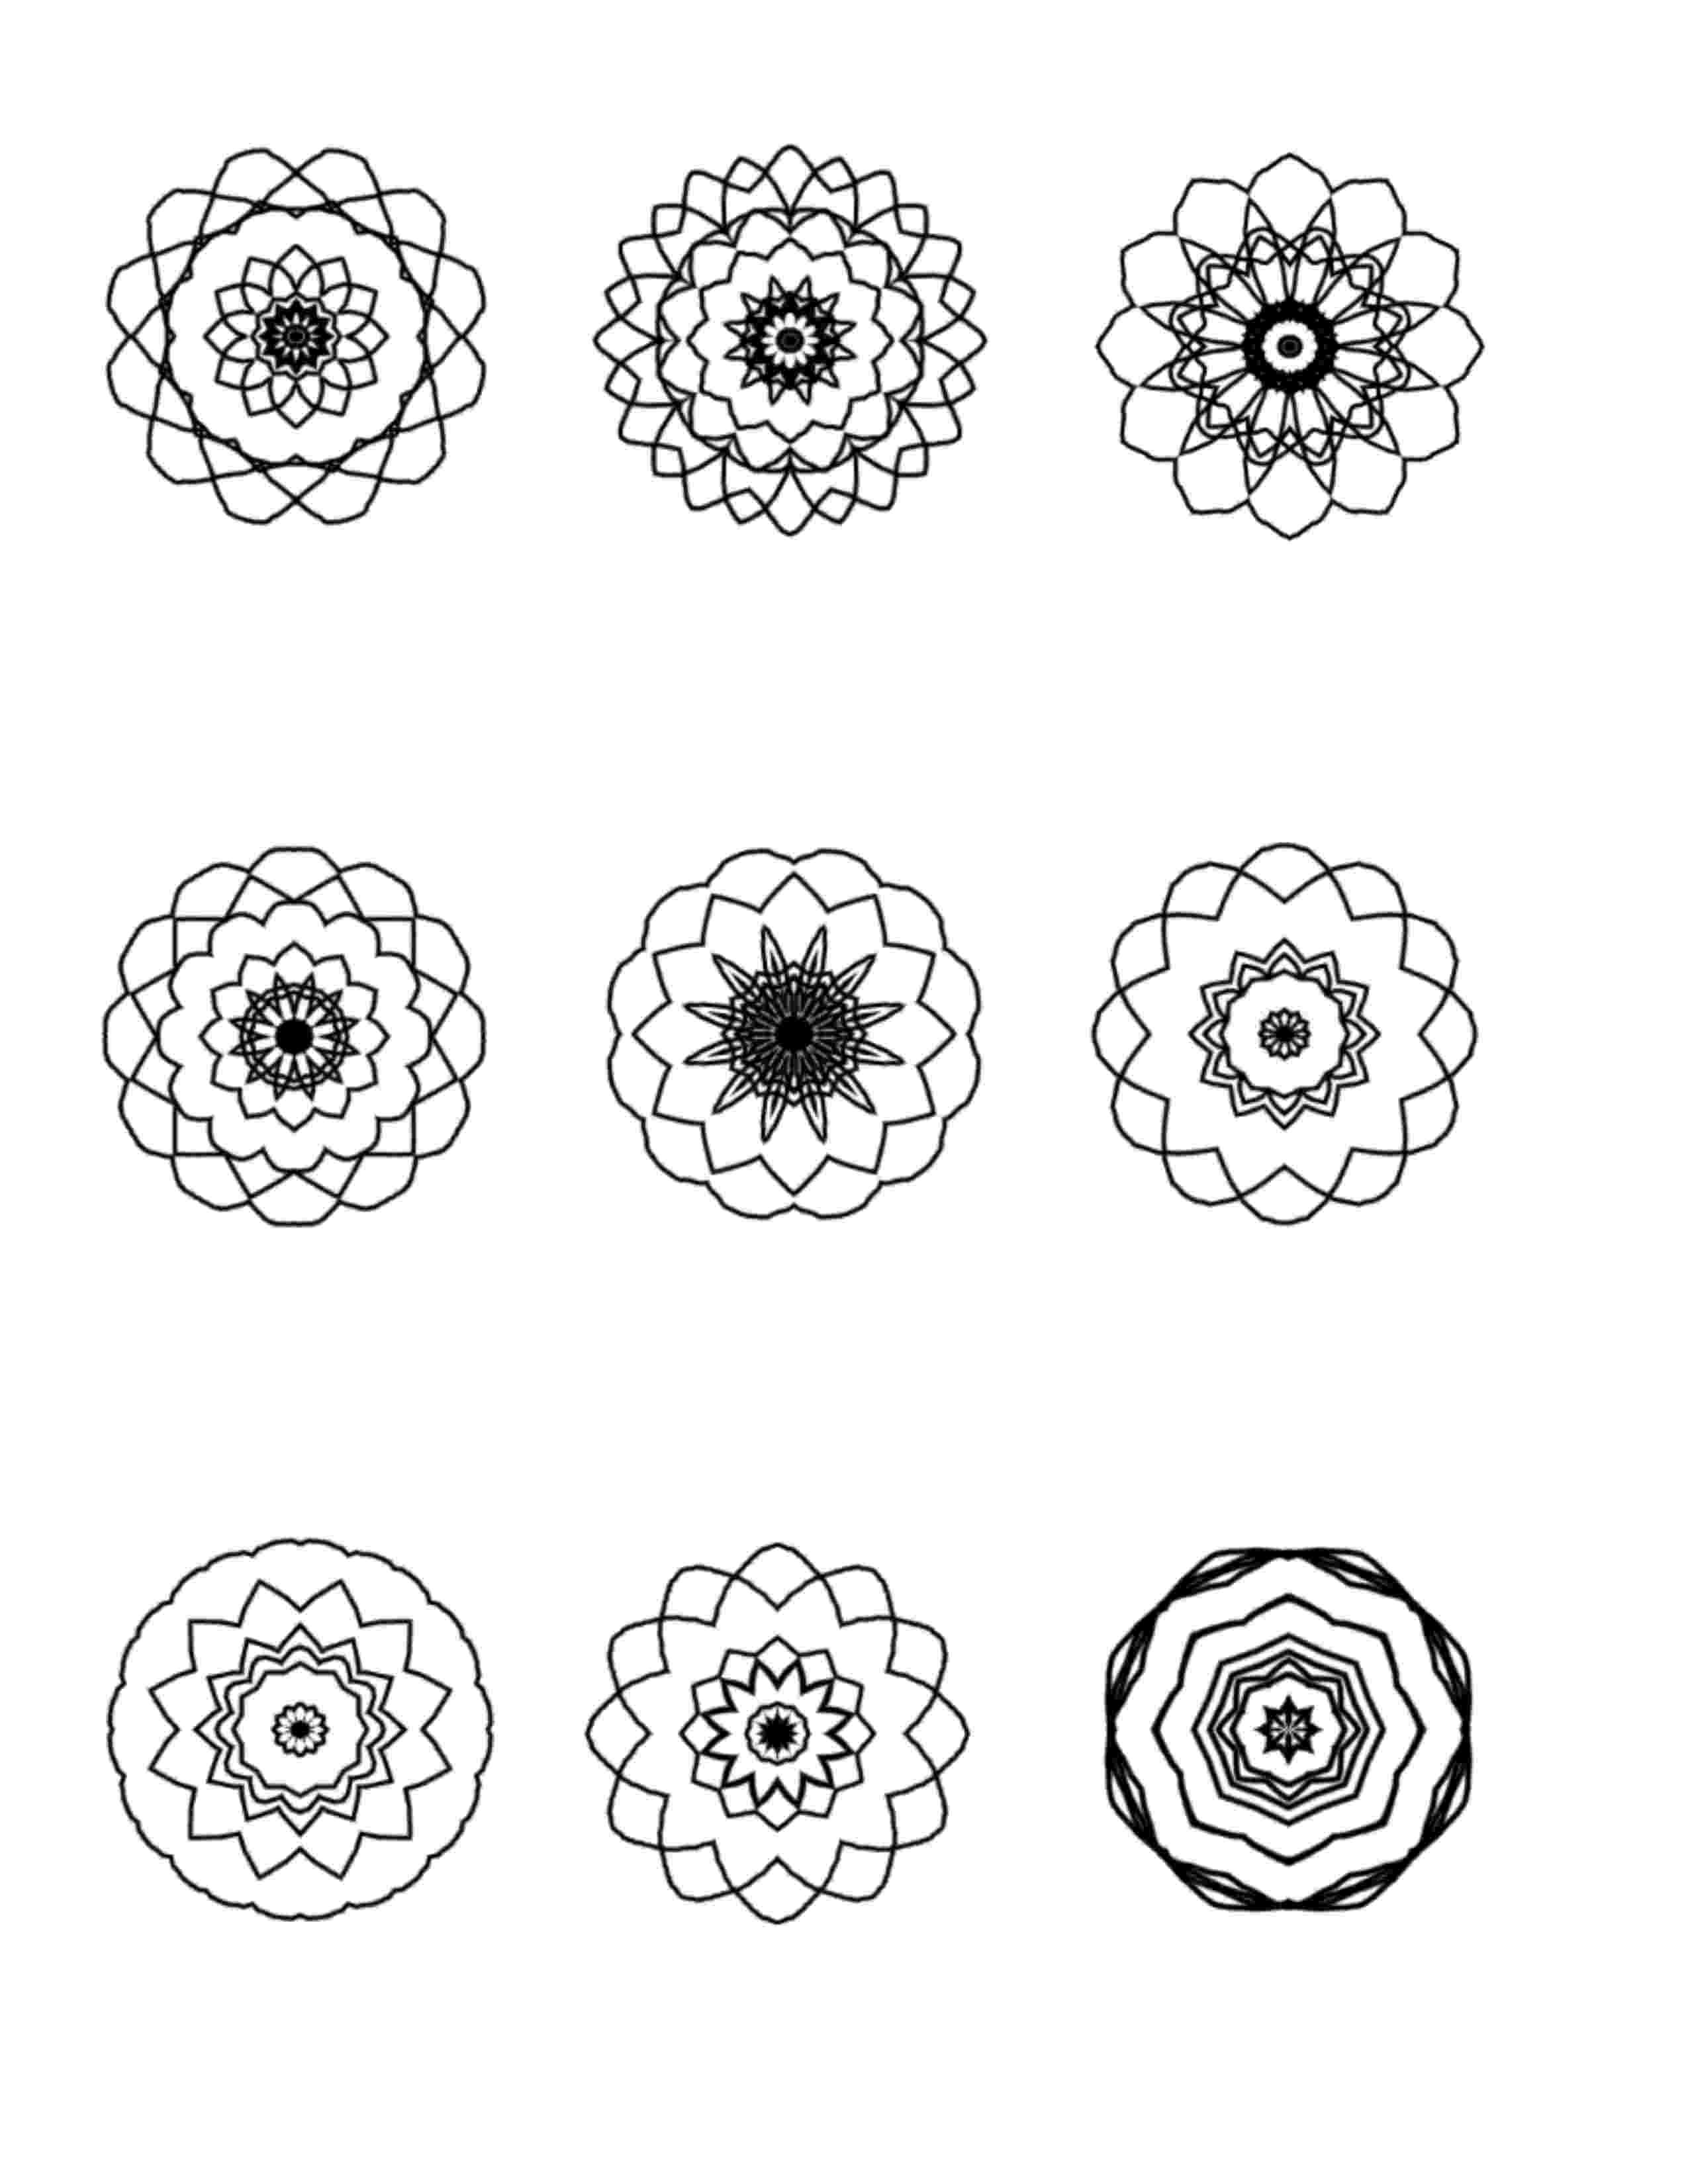 mandalas more mini mandalas to color ilah39s blog about mandalas mandalas